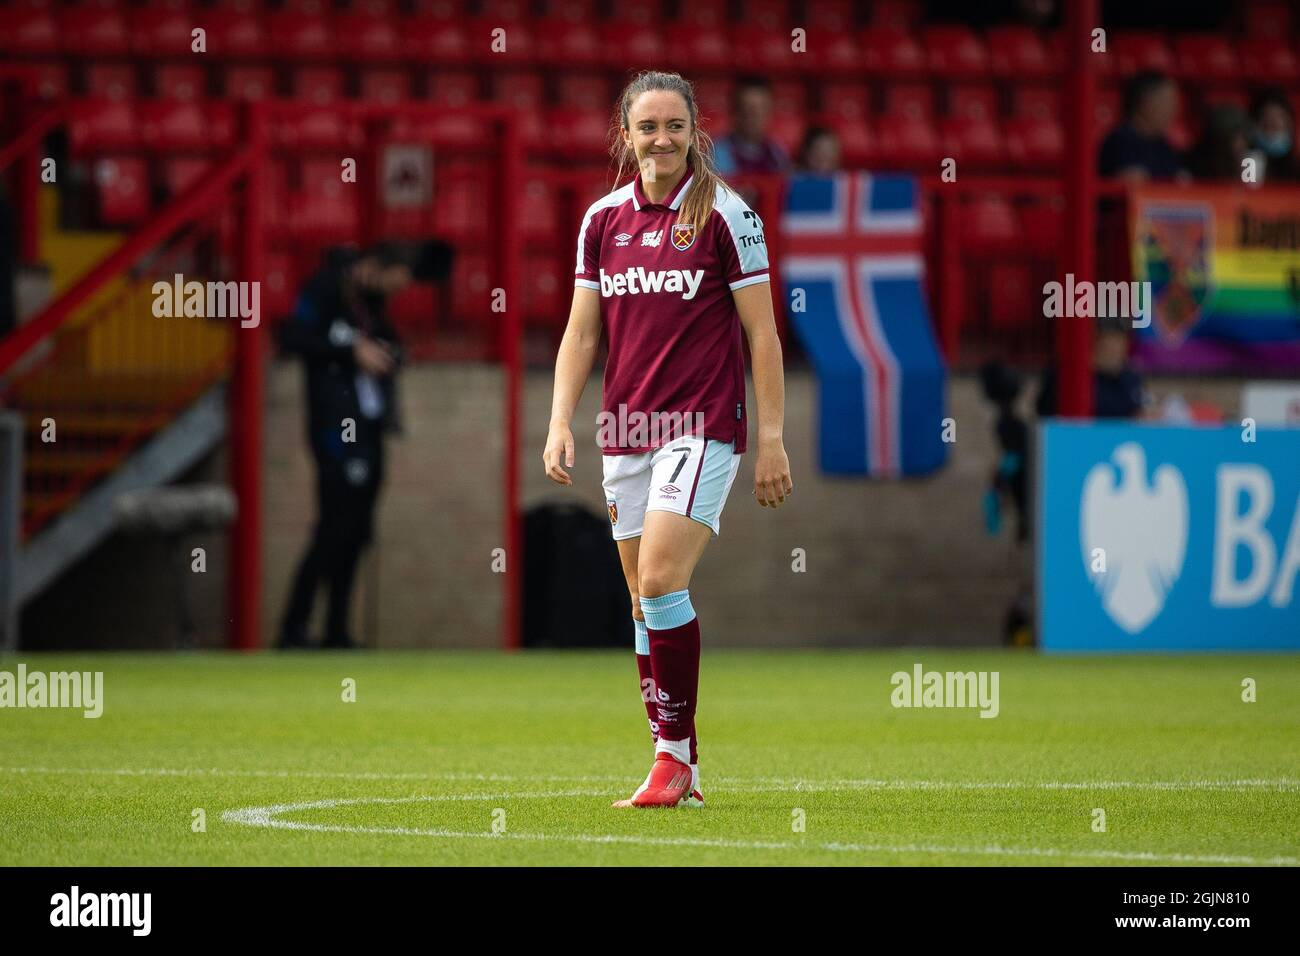 Londres, Reino Unido. 11th de septiembre de 2021. Lisa Evans, de West Ham. Barclays FA Super League West Ham - Mujer contra Aston Villa. Crédito: Liam Asman/Alamy Live News Foto de stock